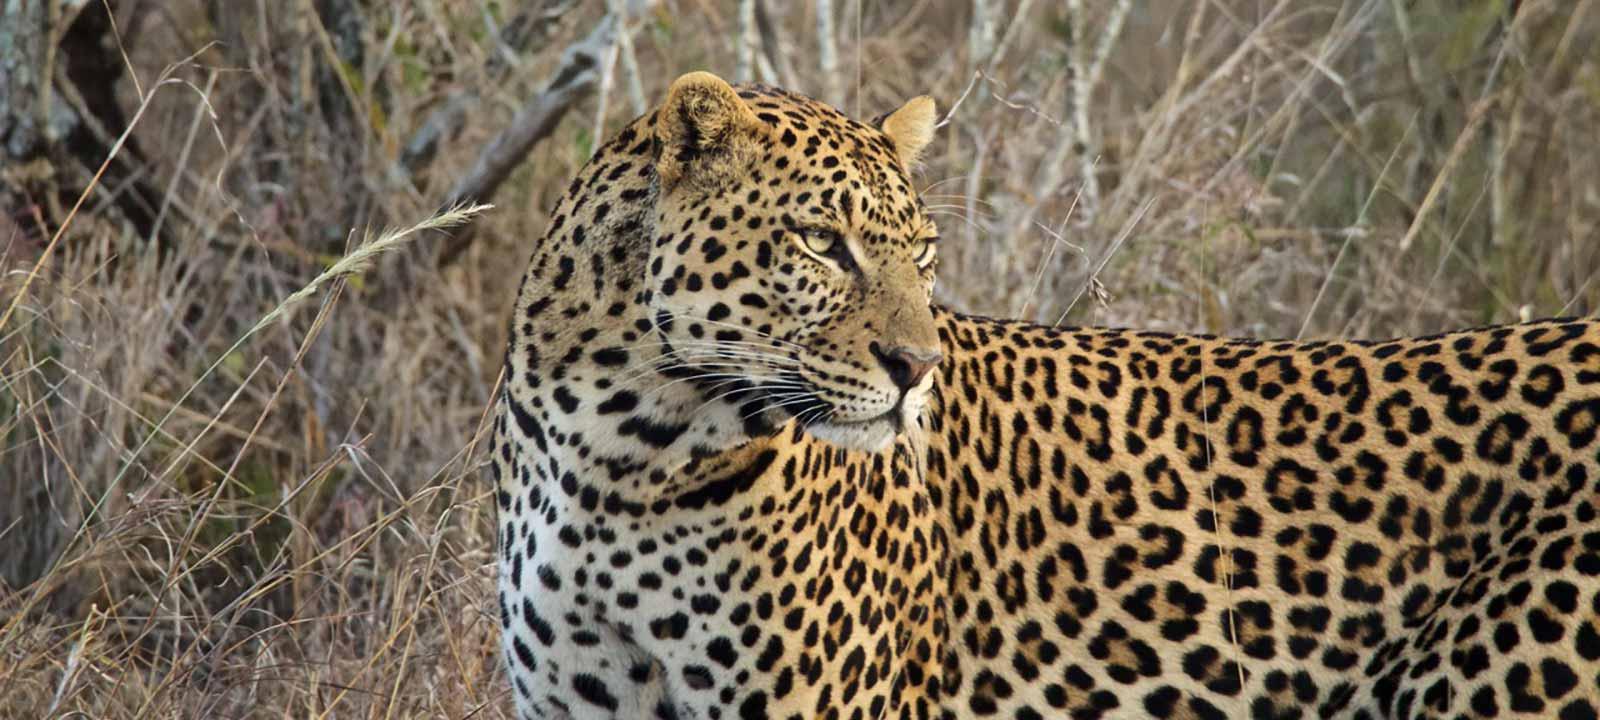 leopard-closeup.jpg